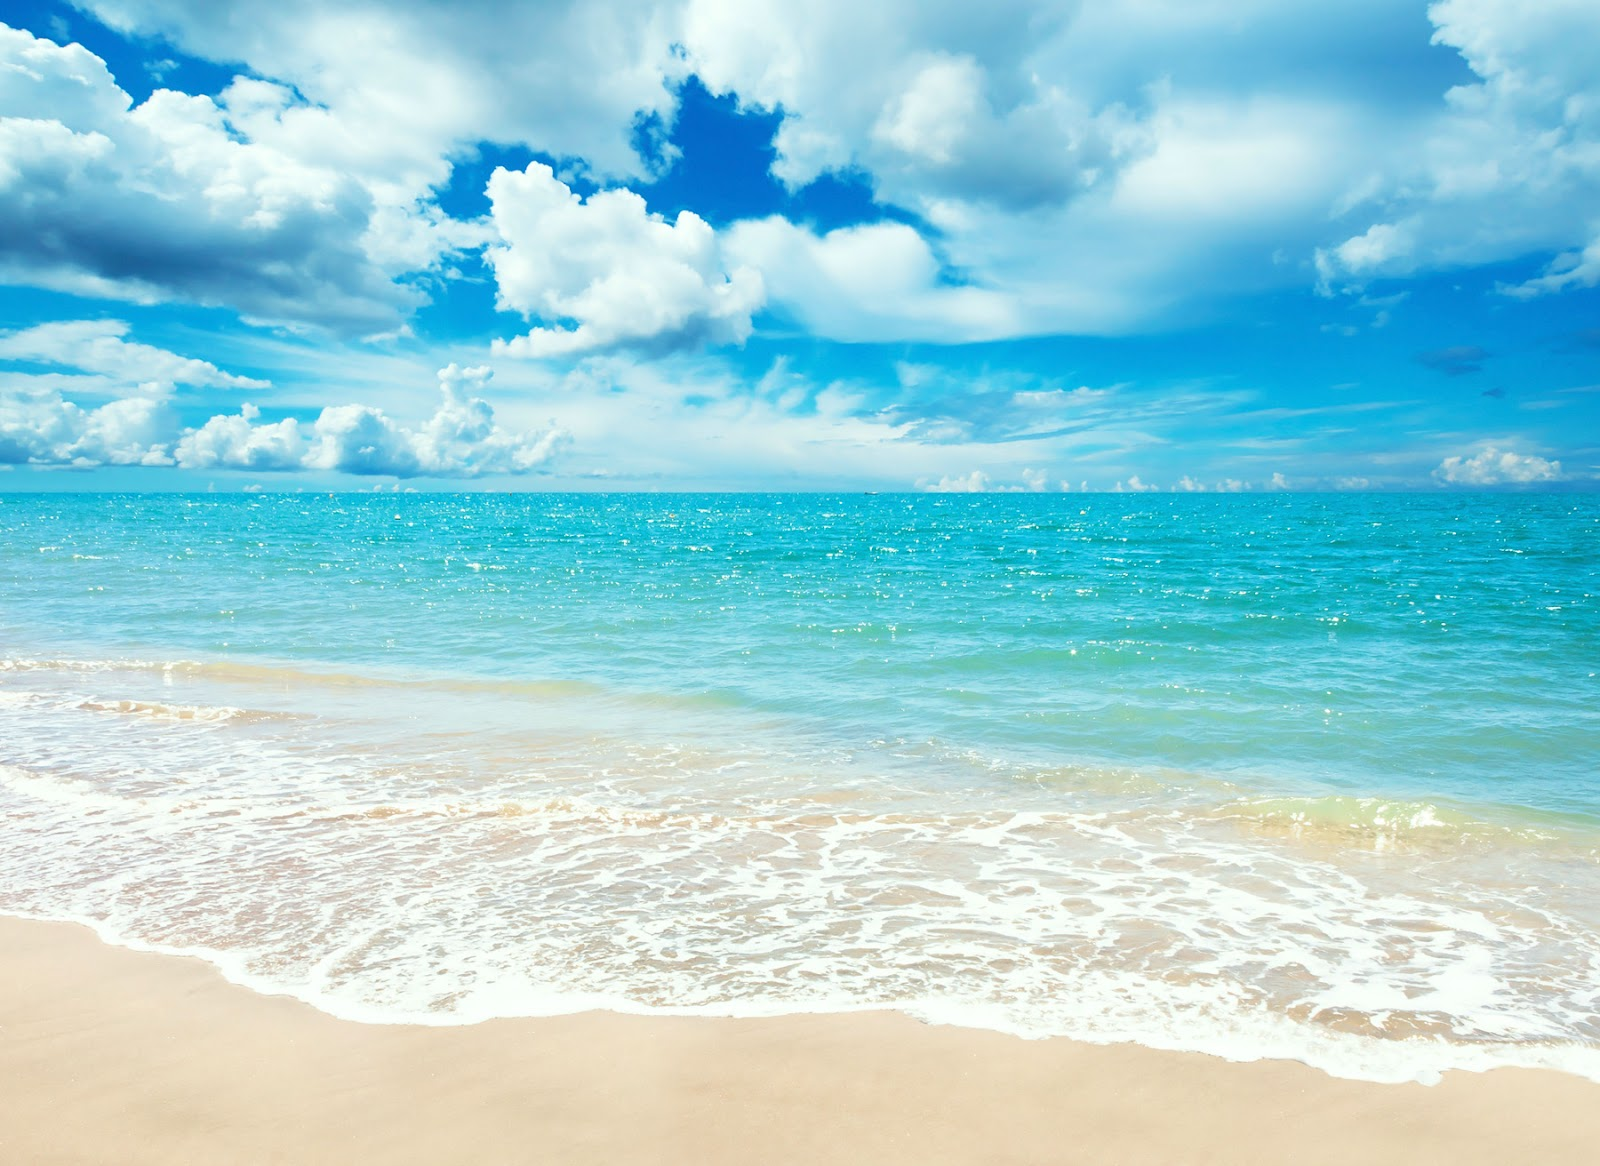 Beach And Sea Khoirulpage